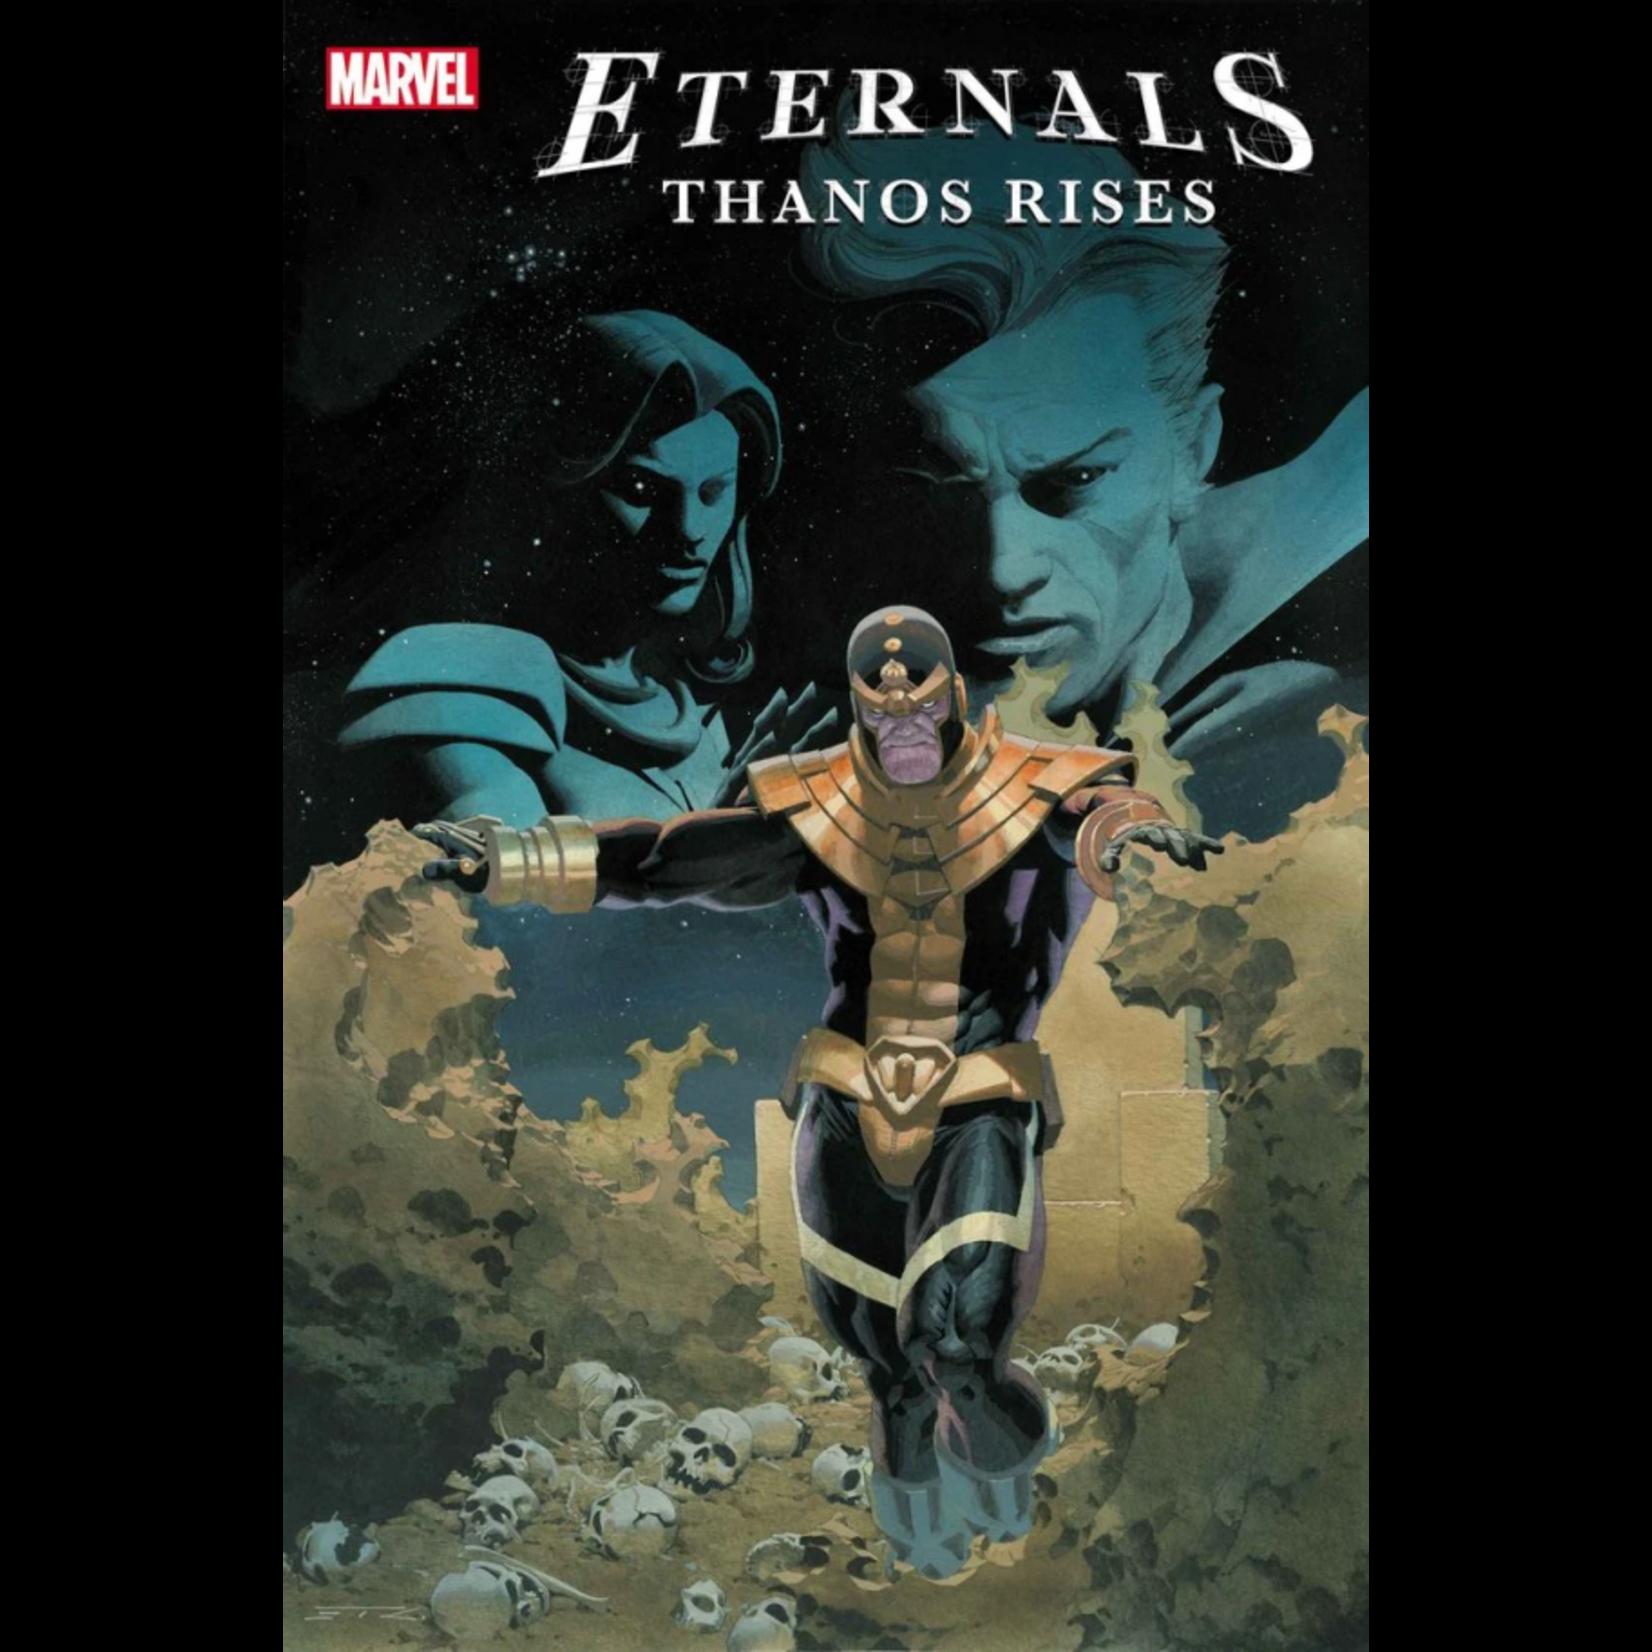 Eternals: Thanos Rises #1